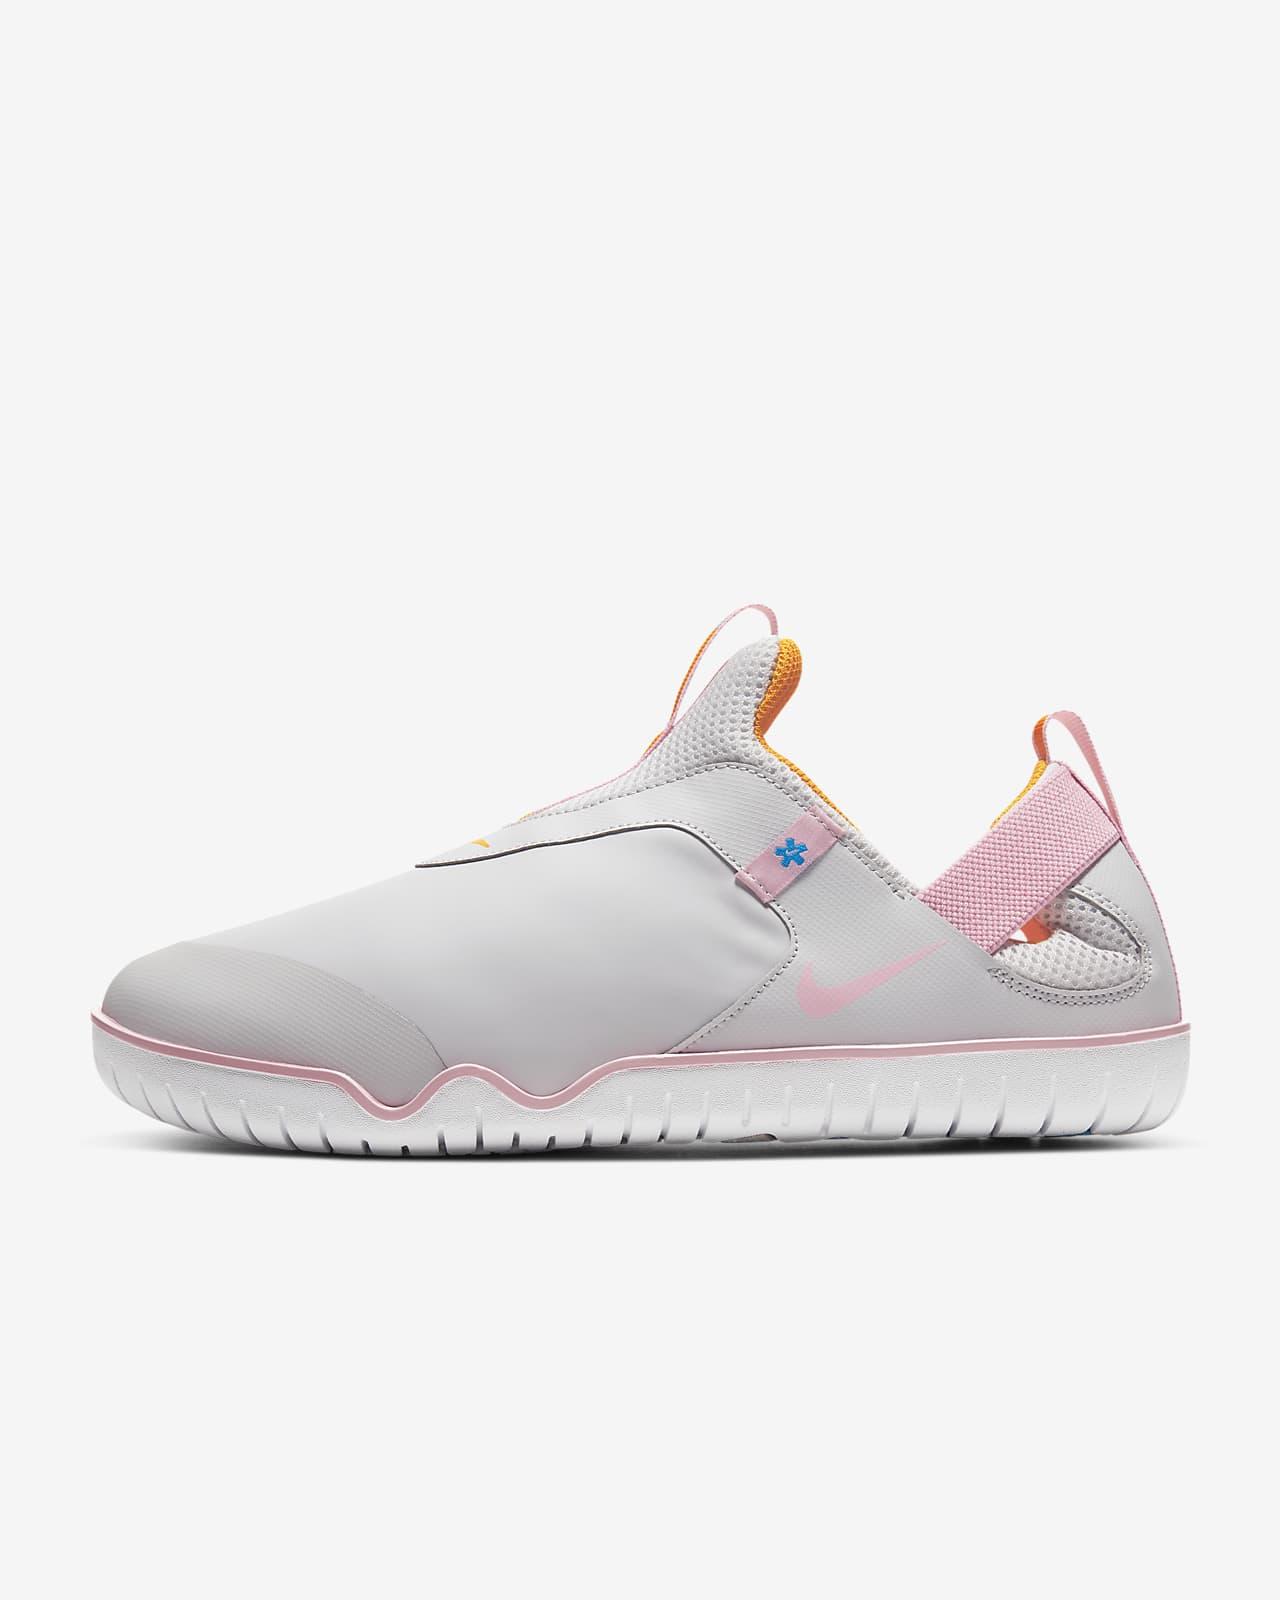 Calzado Nike Air Zoom Pulse